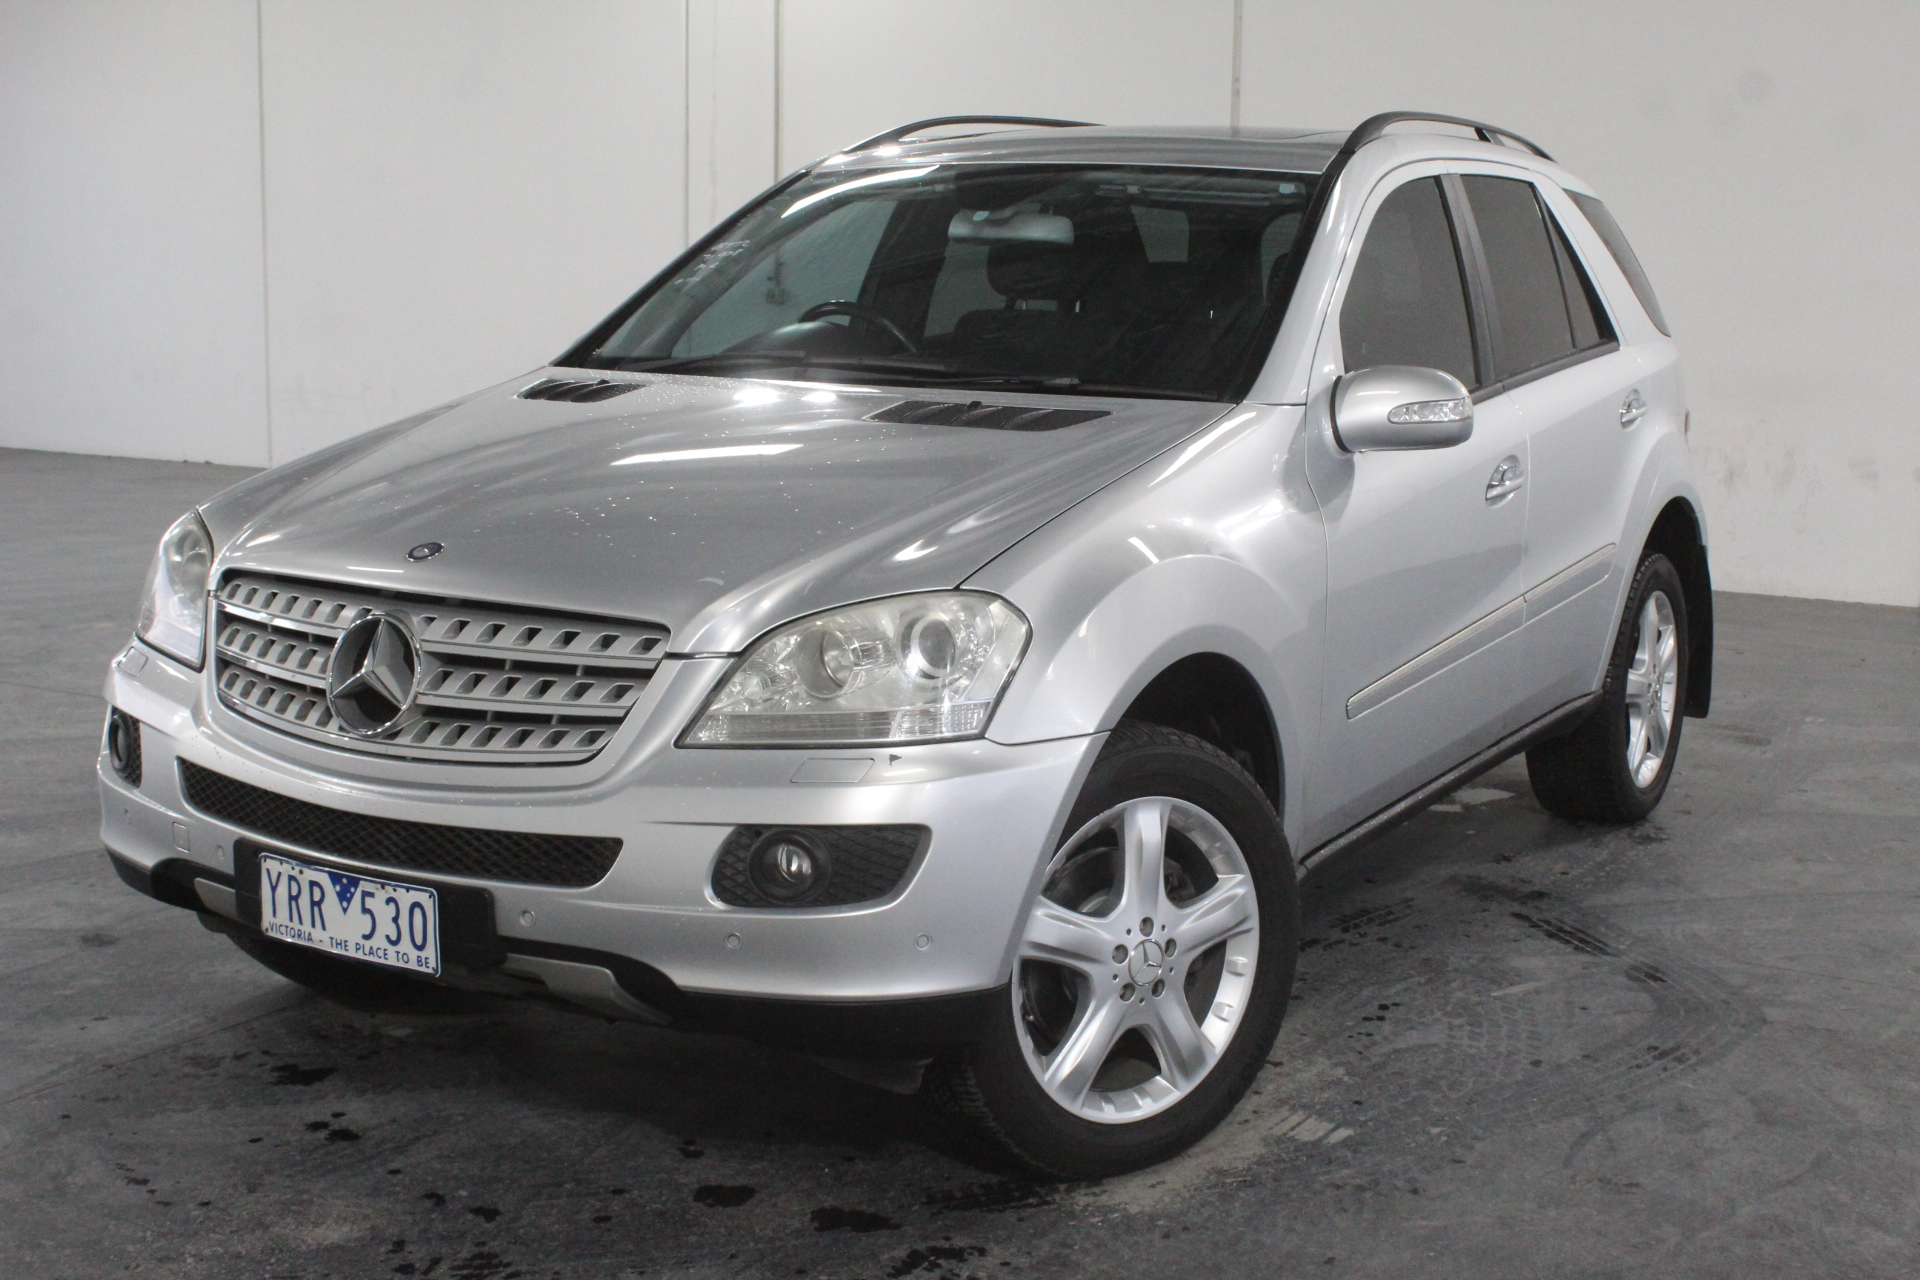 2006 Mercedes Benz ML 350 (4x4) W164 Automatic Wagon